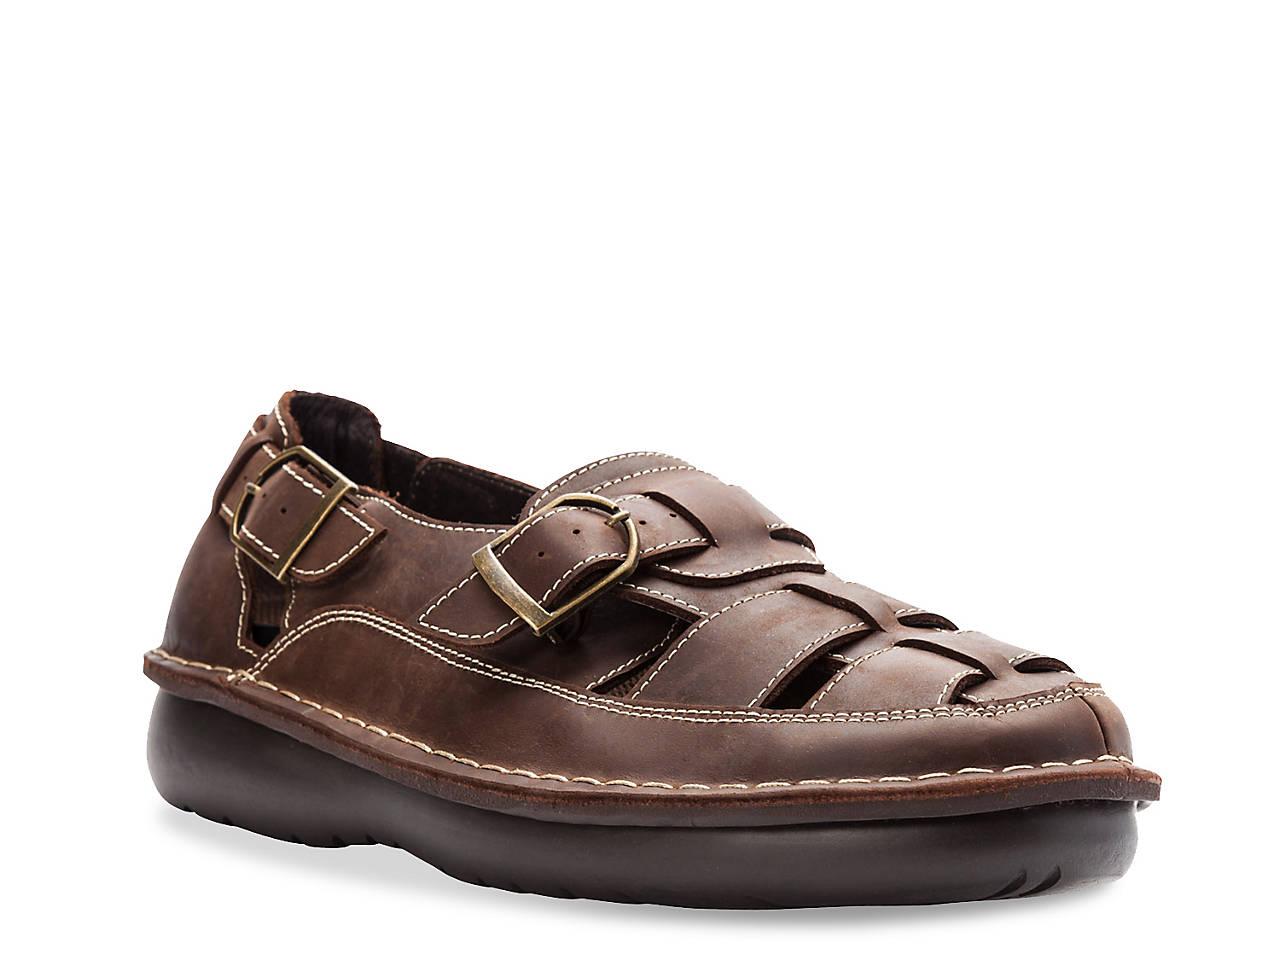 72dabf8f7b1b2a Propet Villager Sandal Men s Shoes